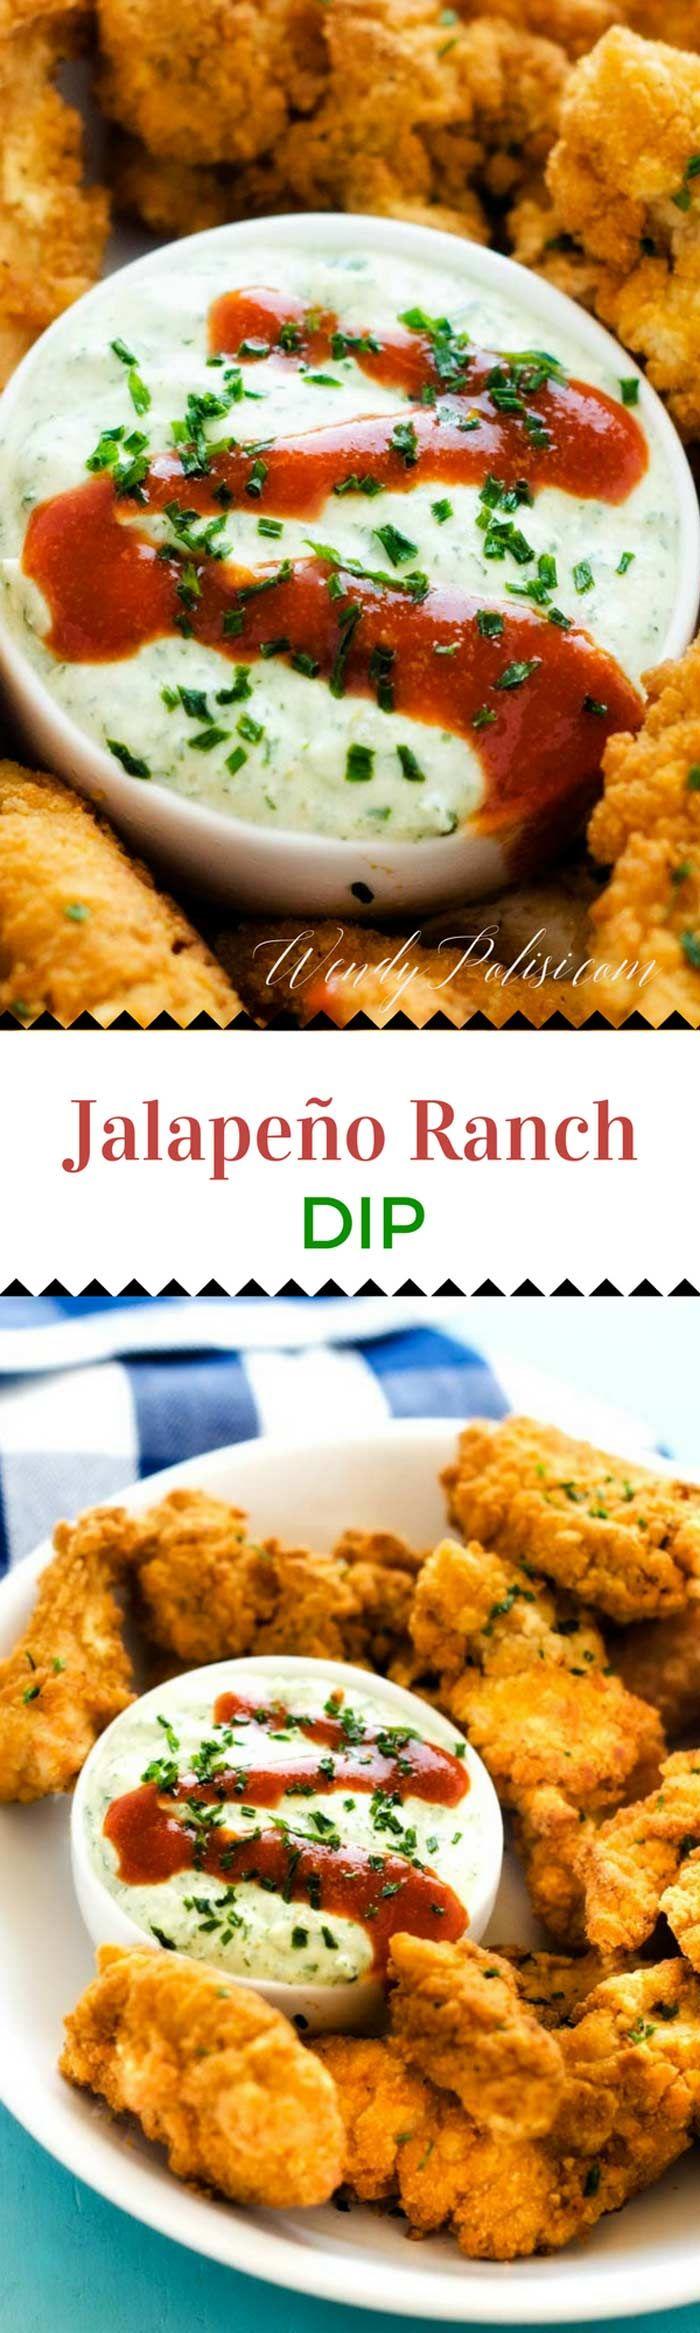 Jalapeño Ranch Dip via @wendypolisi